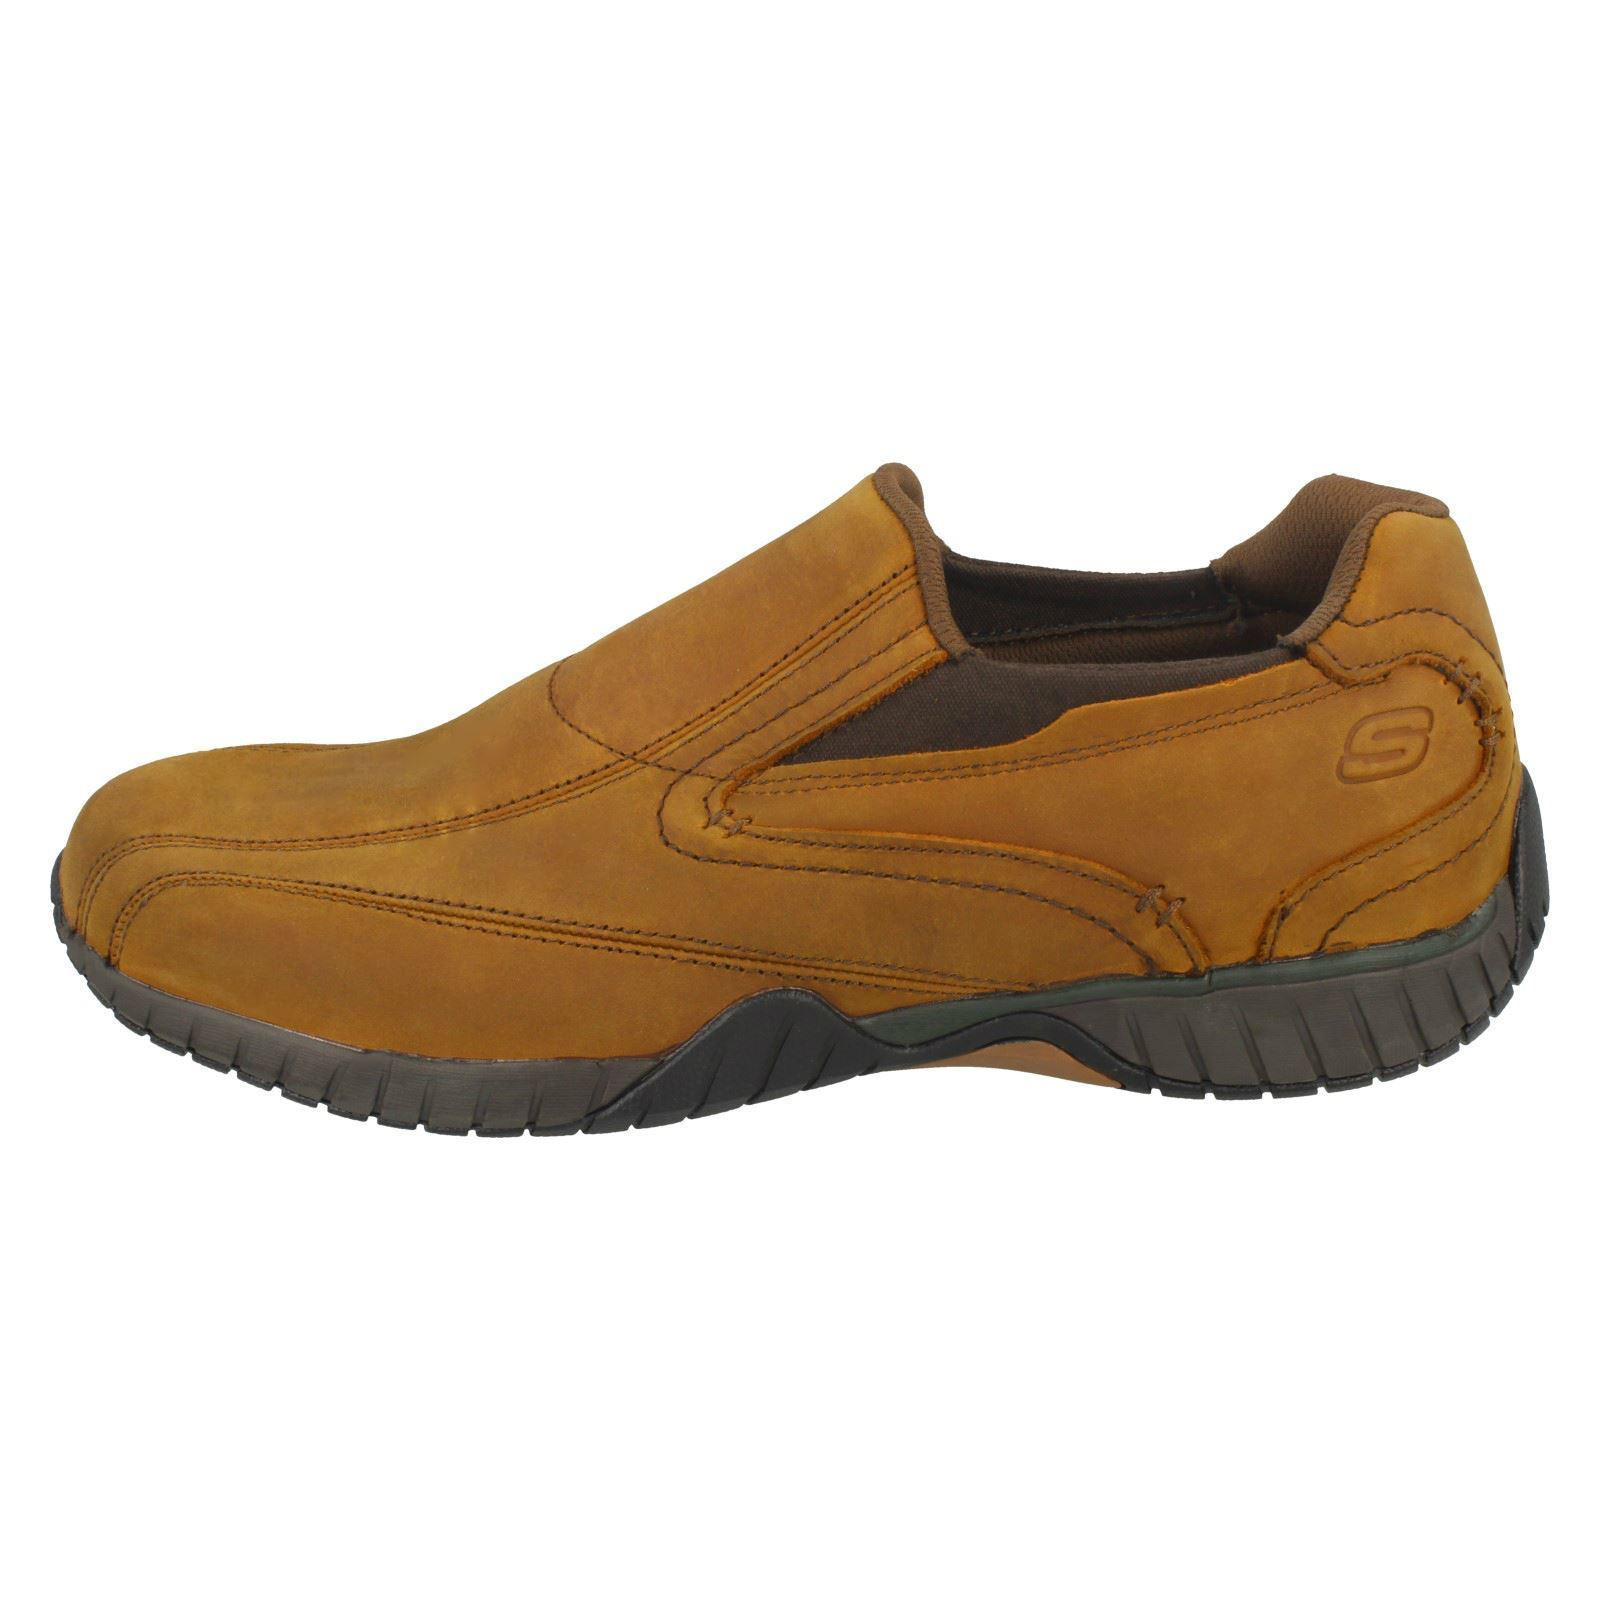 Herren Skechers Slip On Bascom Casual Schuhes / Trainers Label Bascom On  N b501d0